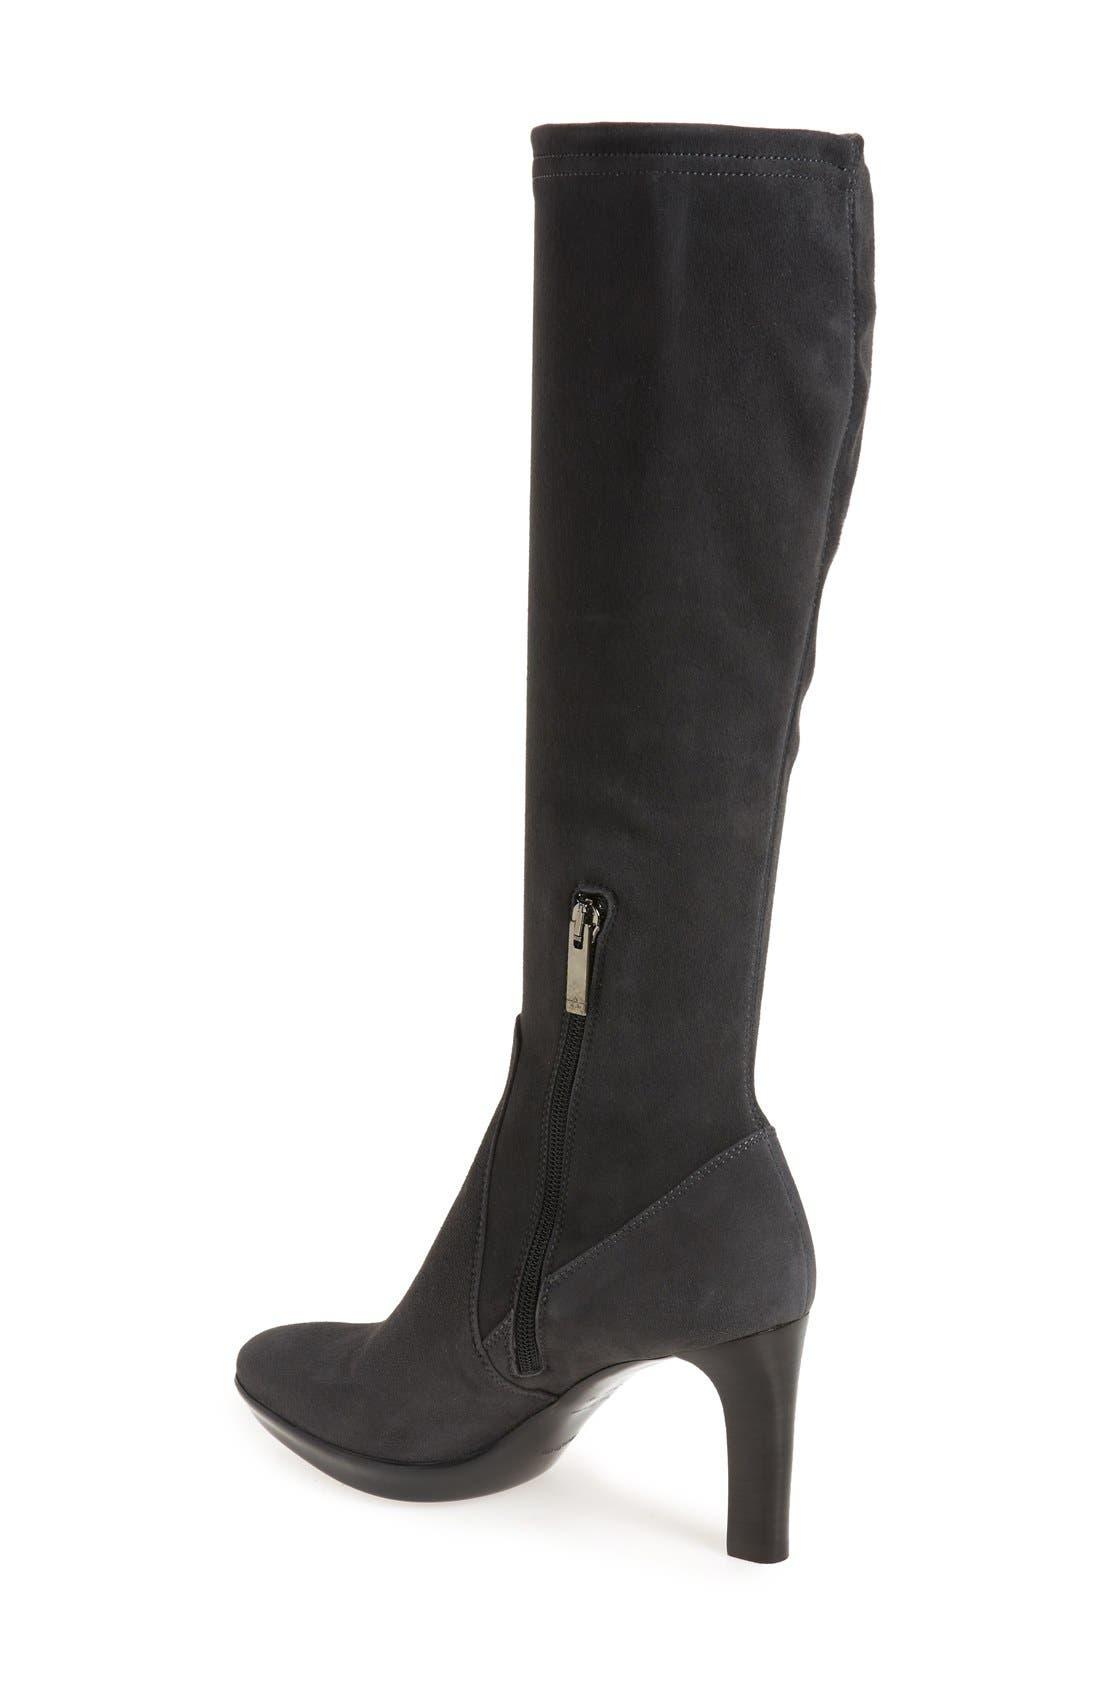 Alternate Image 2  - Aquatalia 'Rumbah' Weatherproof Knee High Stretch Boot (Women)